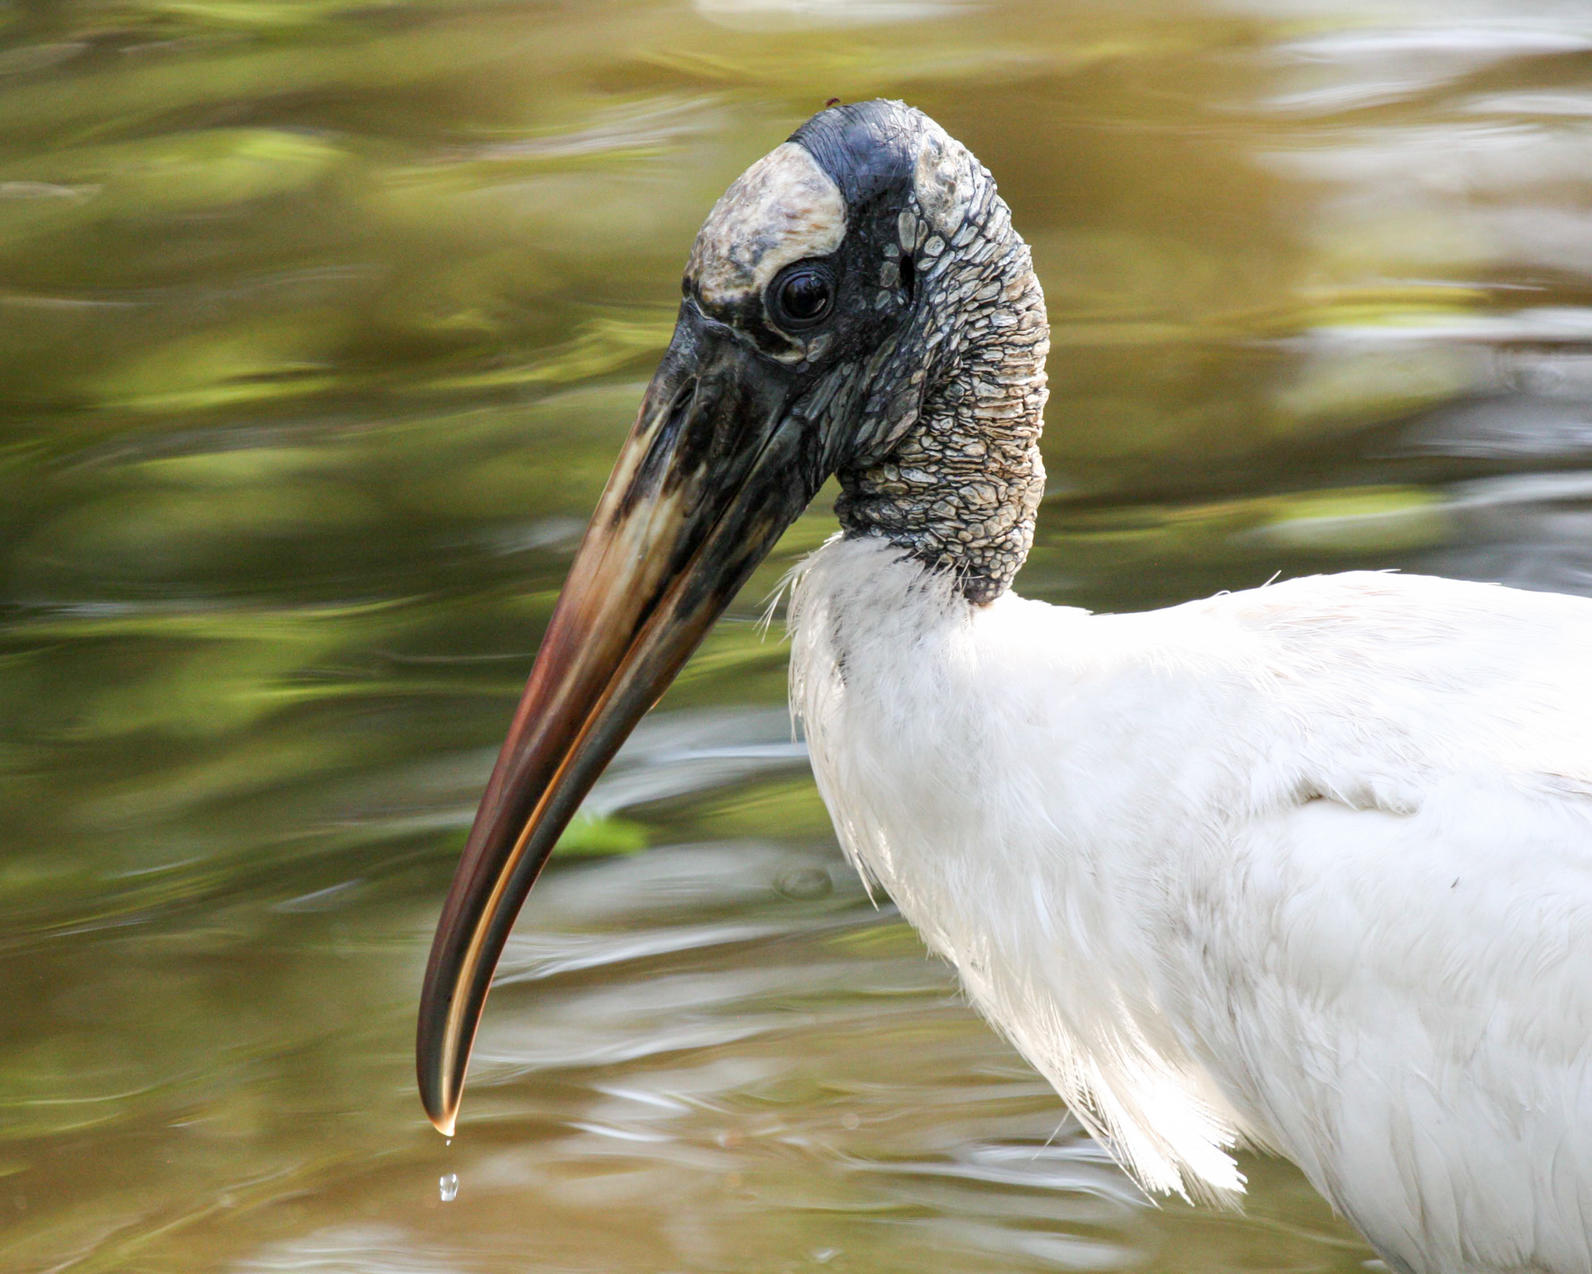 Species: Wood Stork. Photographer: Misty Nelson